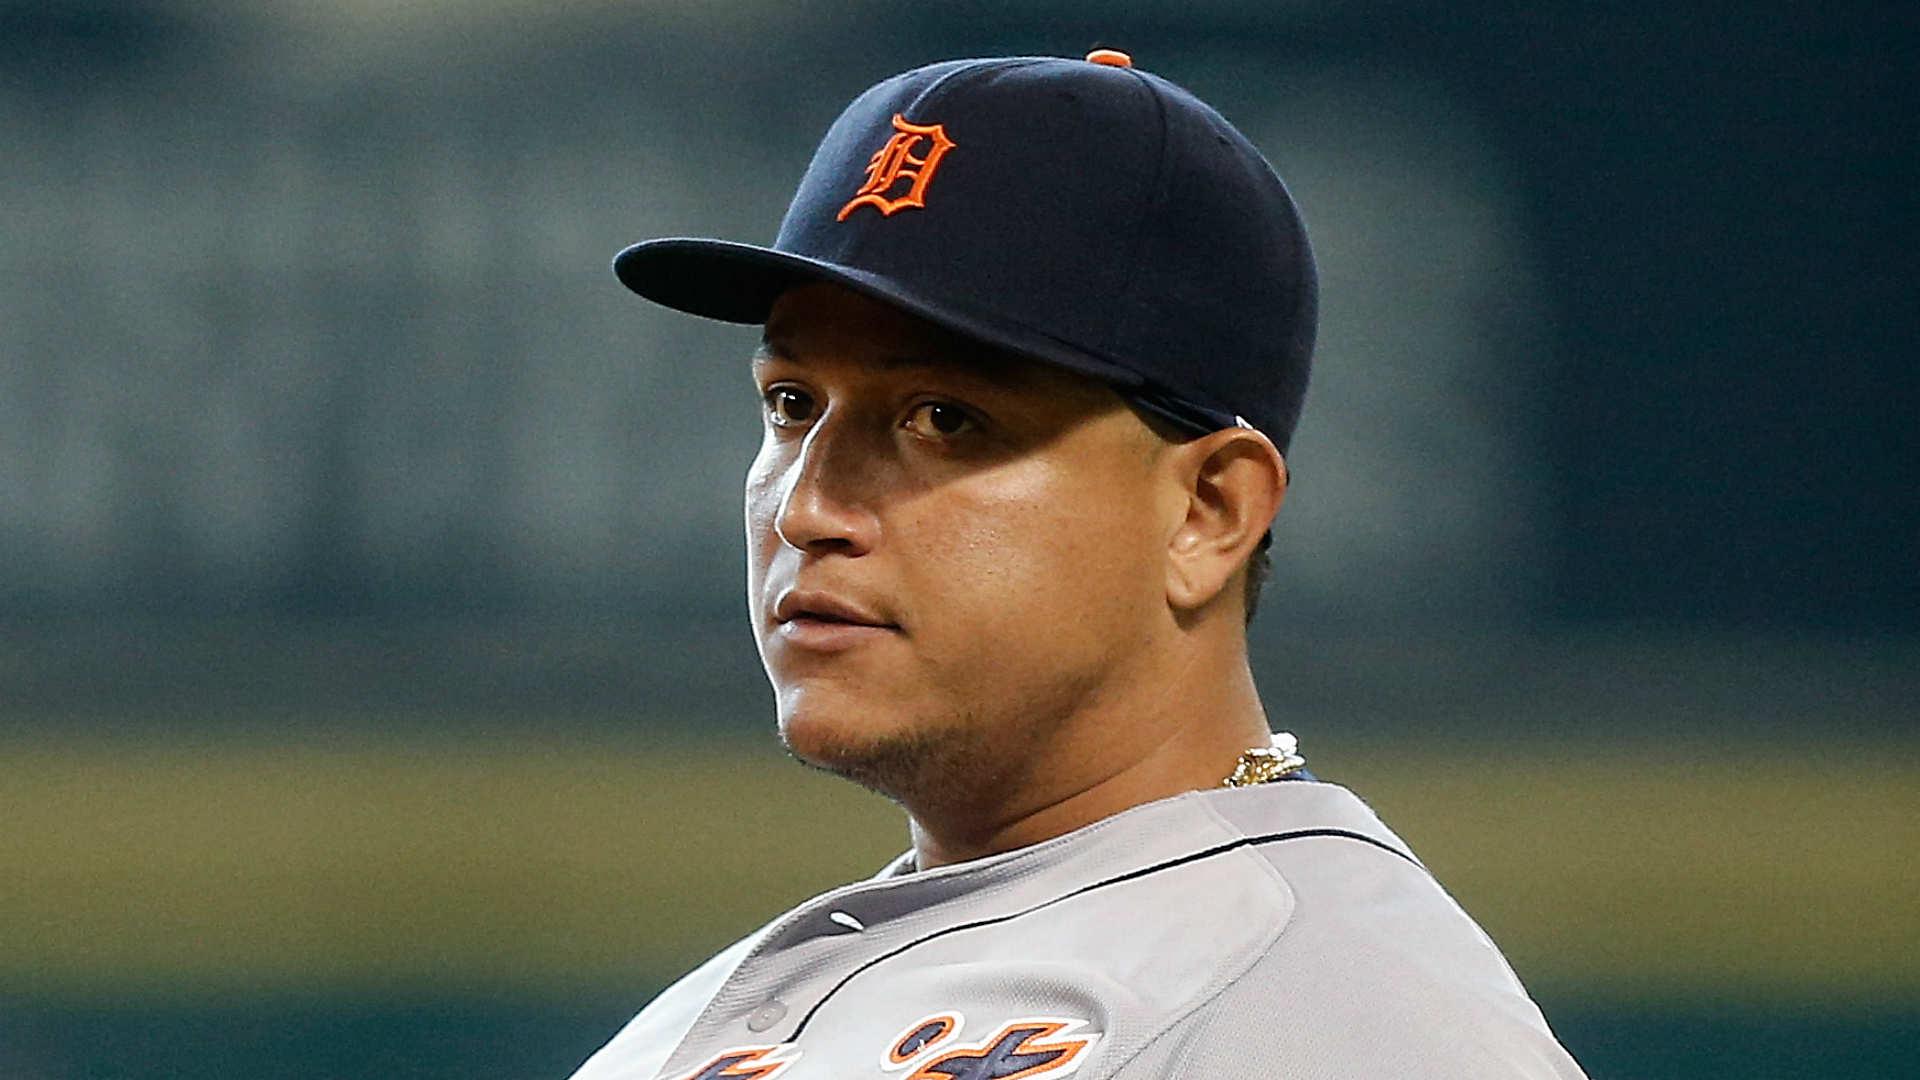 Tigers' Miguel Cabrera trades baseball for fan's 'Fire ...